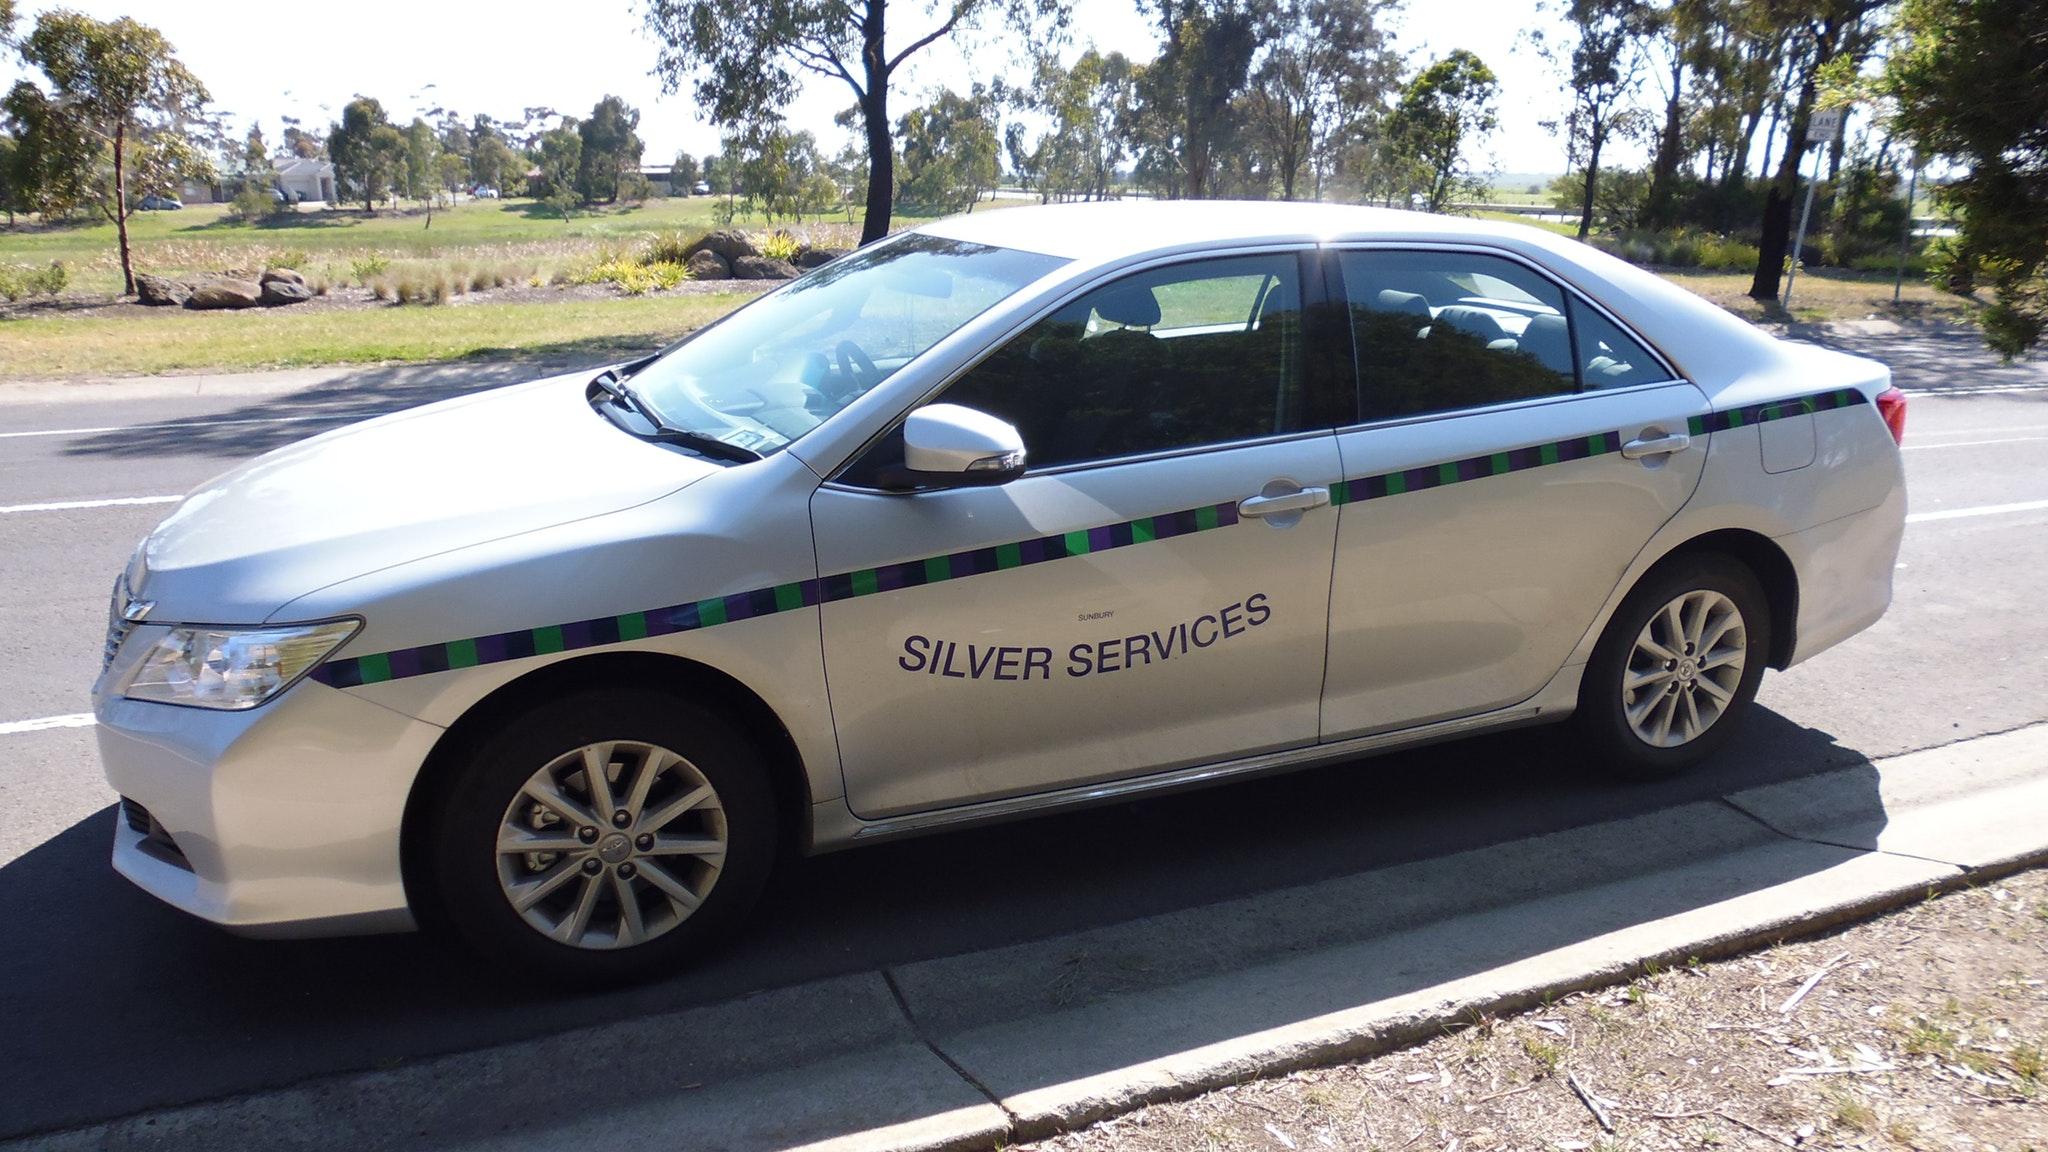 Silver Service Airport Transfer